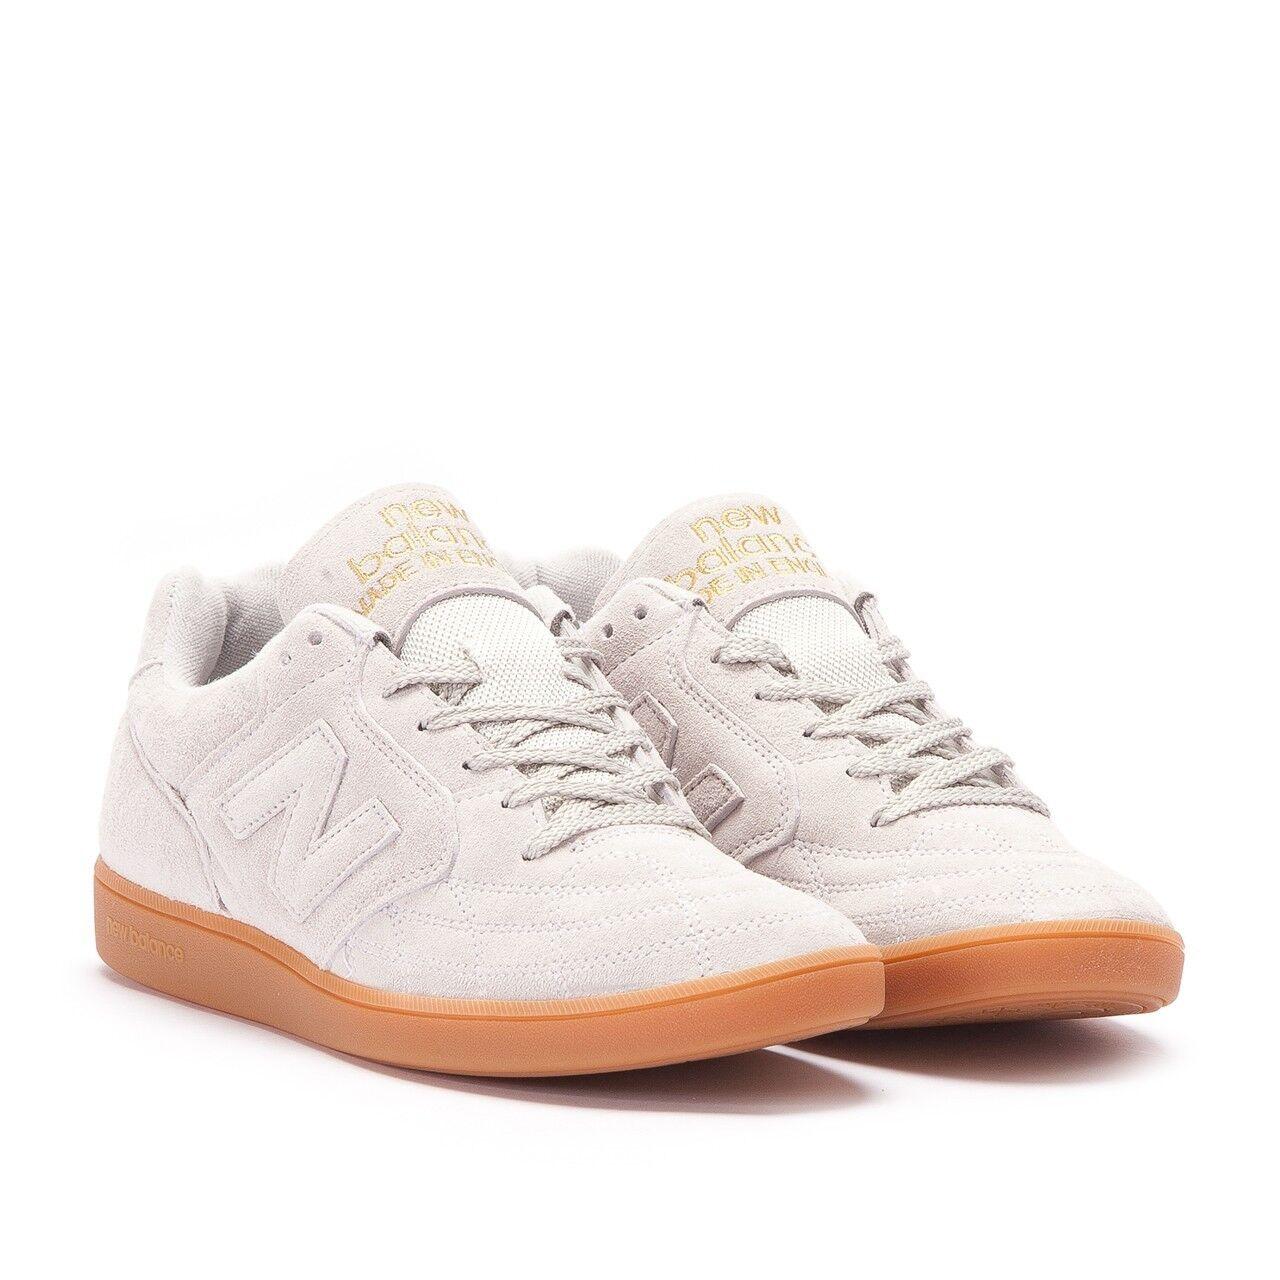 New balance épica TR blanco goma de mascar Zapatillas Hecho en Inglaterra casuales Zapatillas mascar Talla fccf34